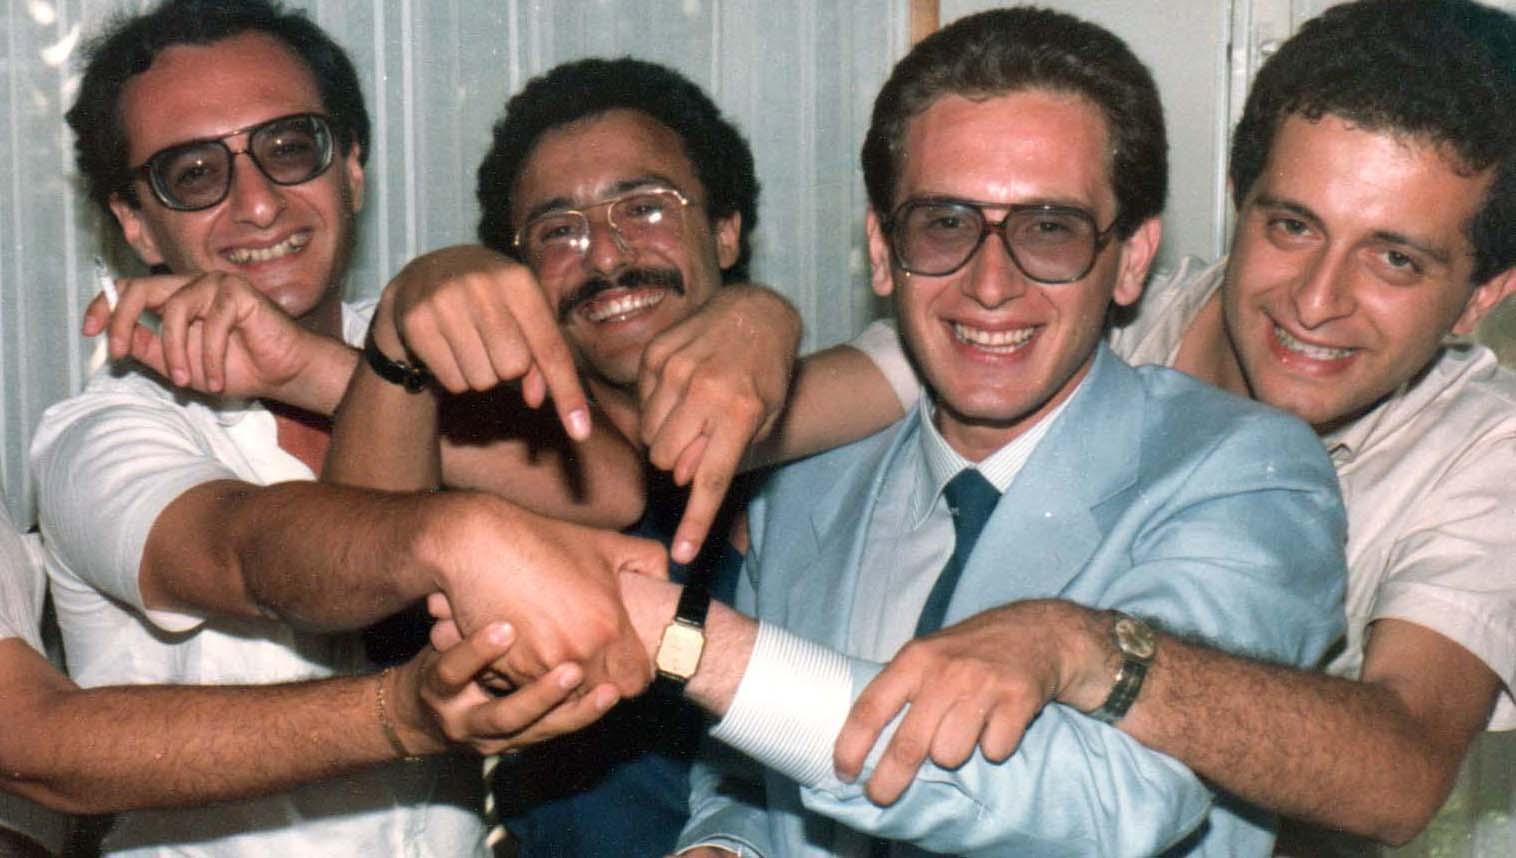 Enzo Gulotta - Giacomo Rodriquenz - Alberto Adragna - Beppino Tartaro